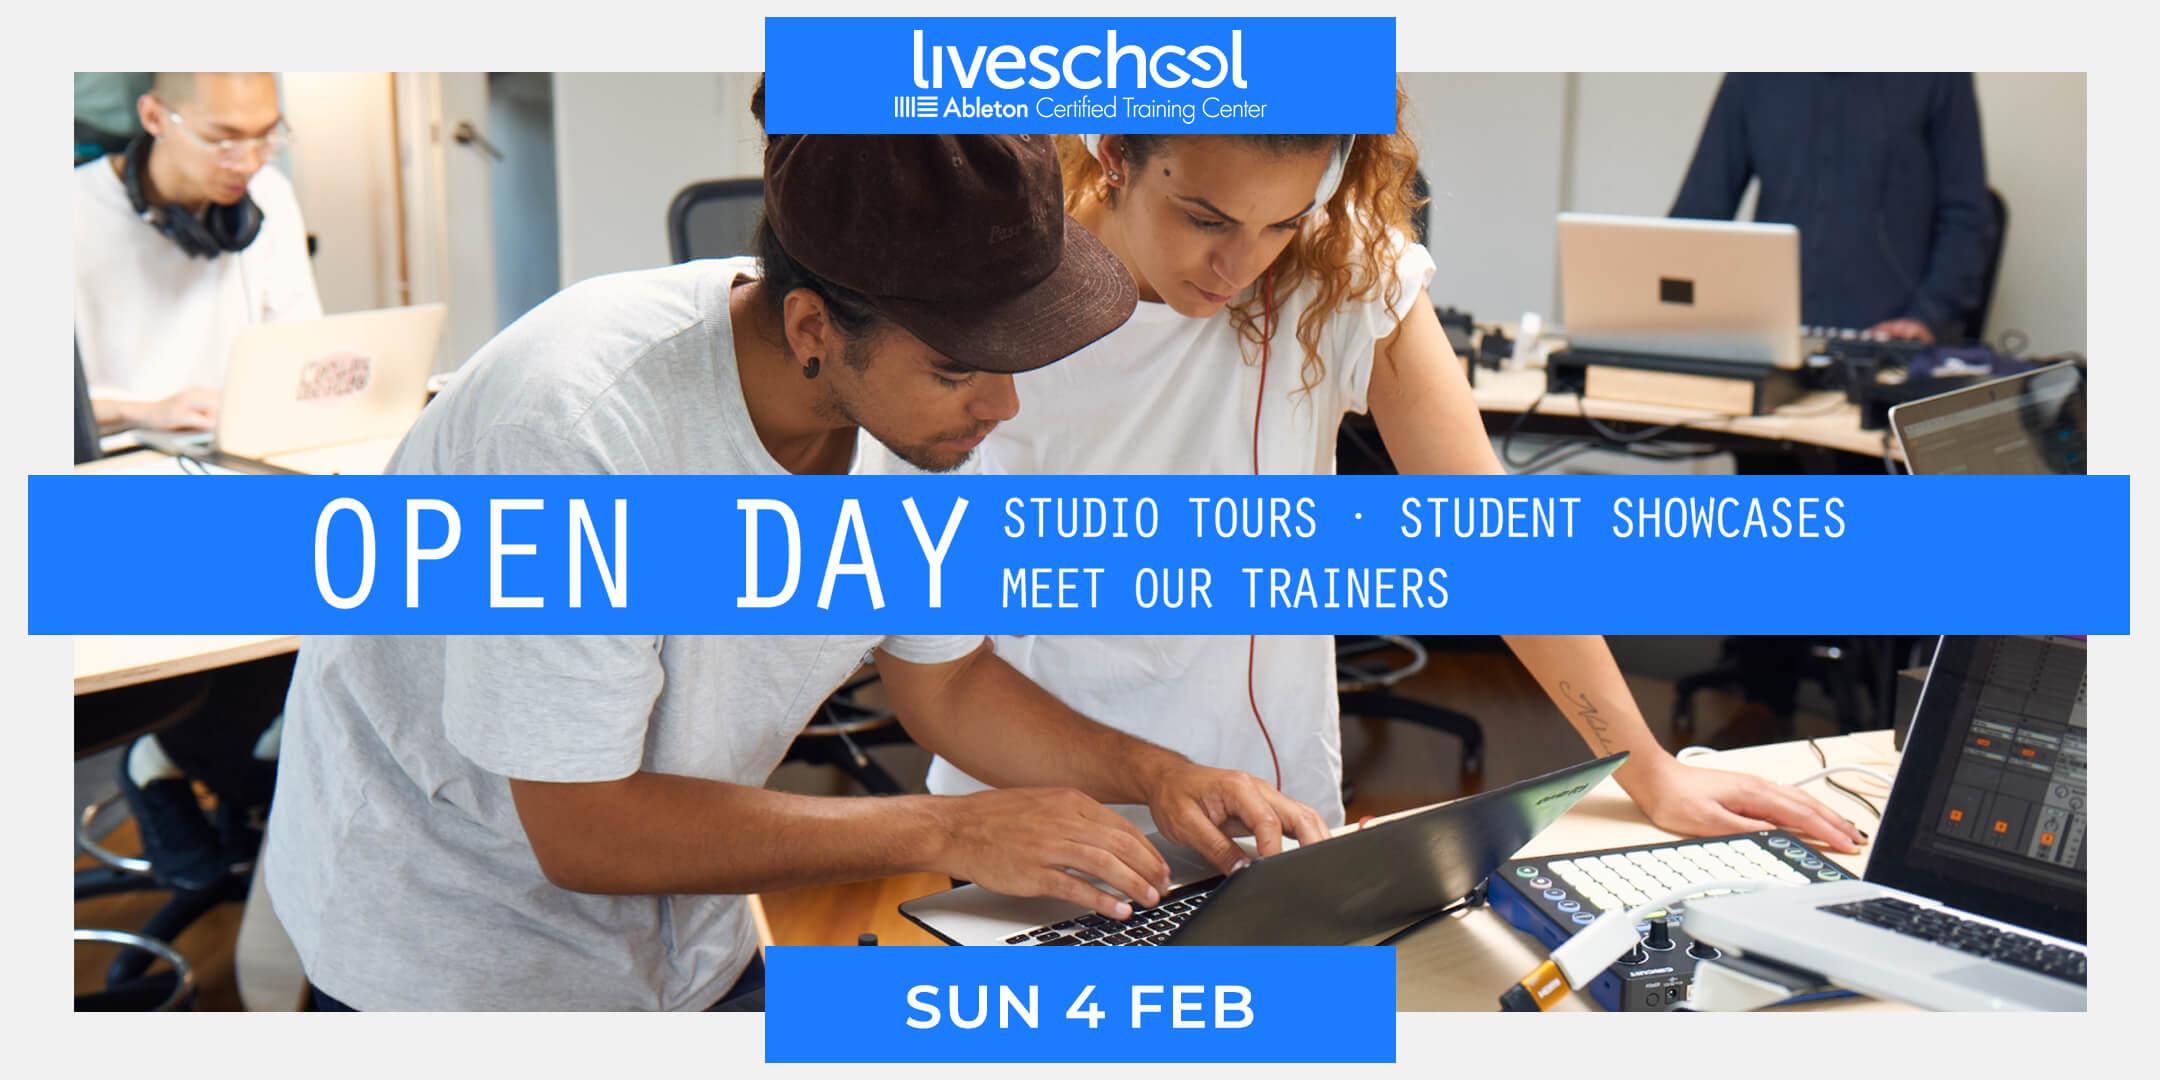 Liveschool Open Day Sunday 4 February 2018